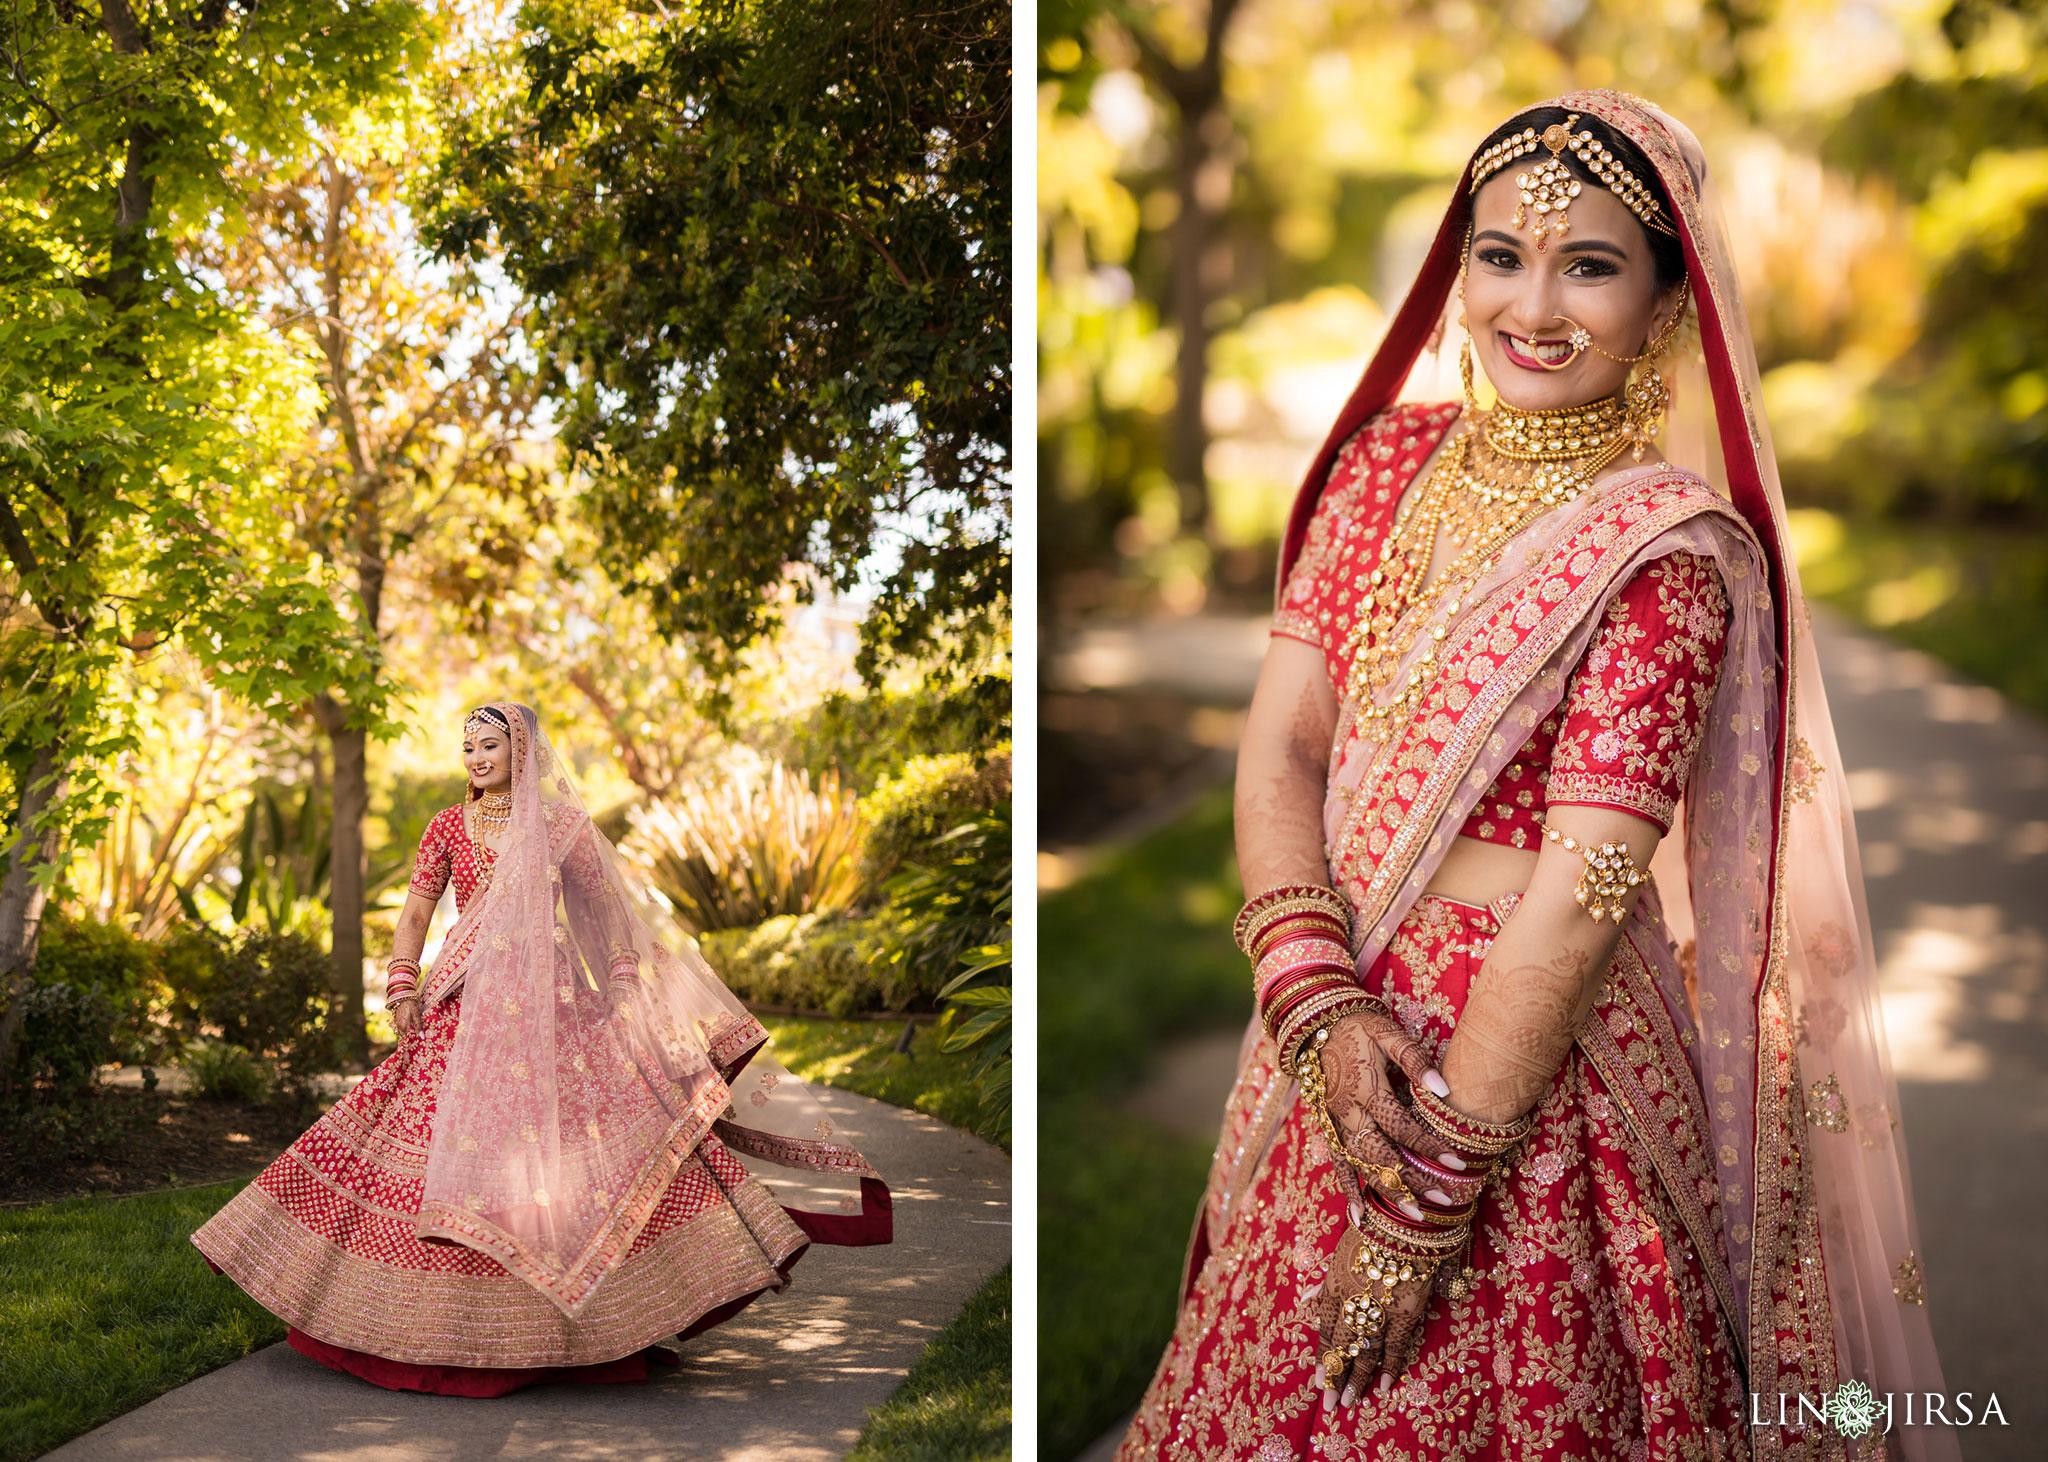 06 four seasons westlake village indian bride wedding photography